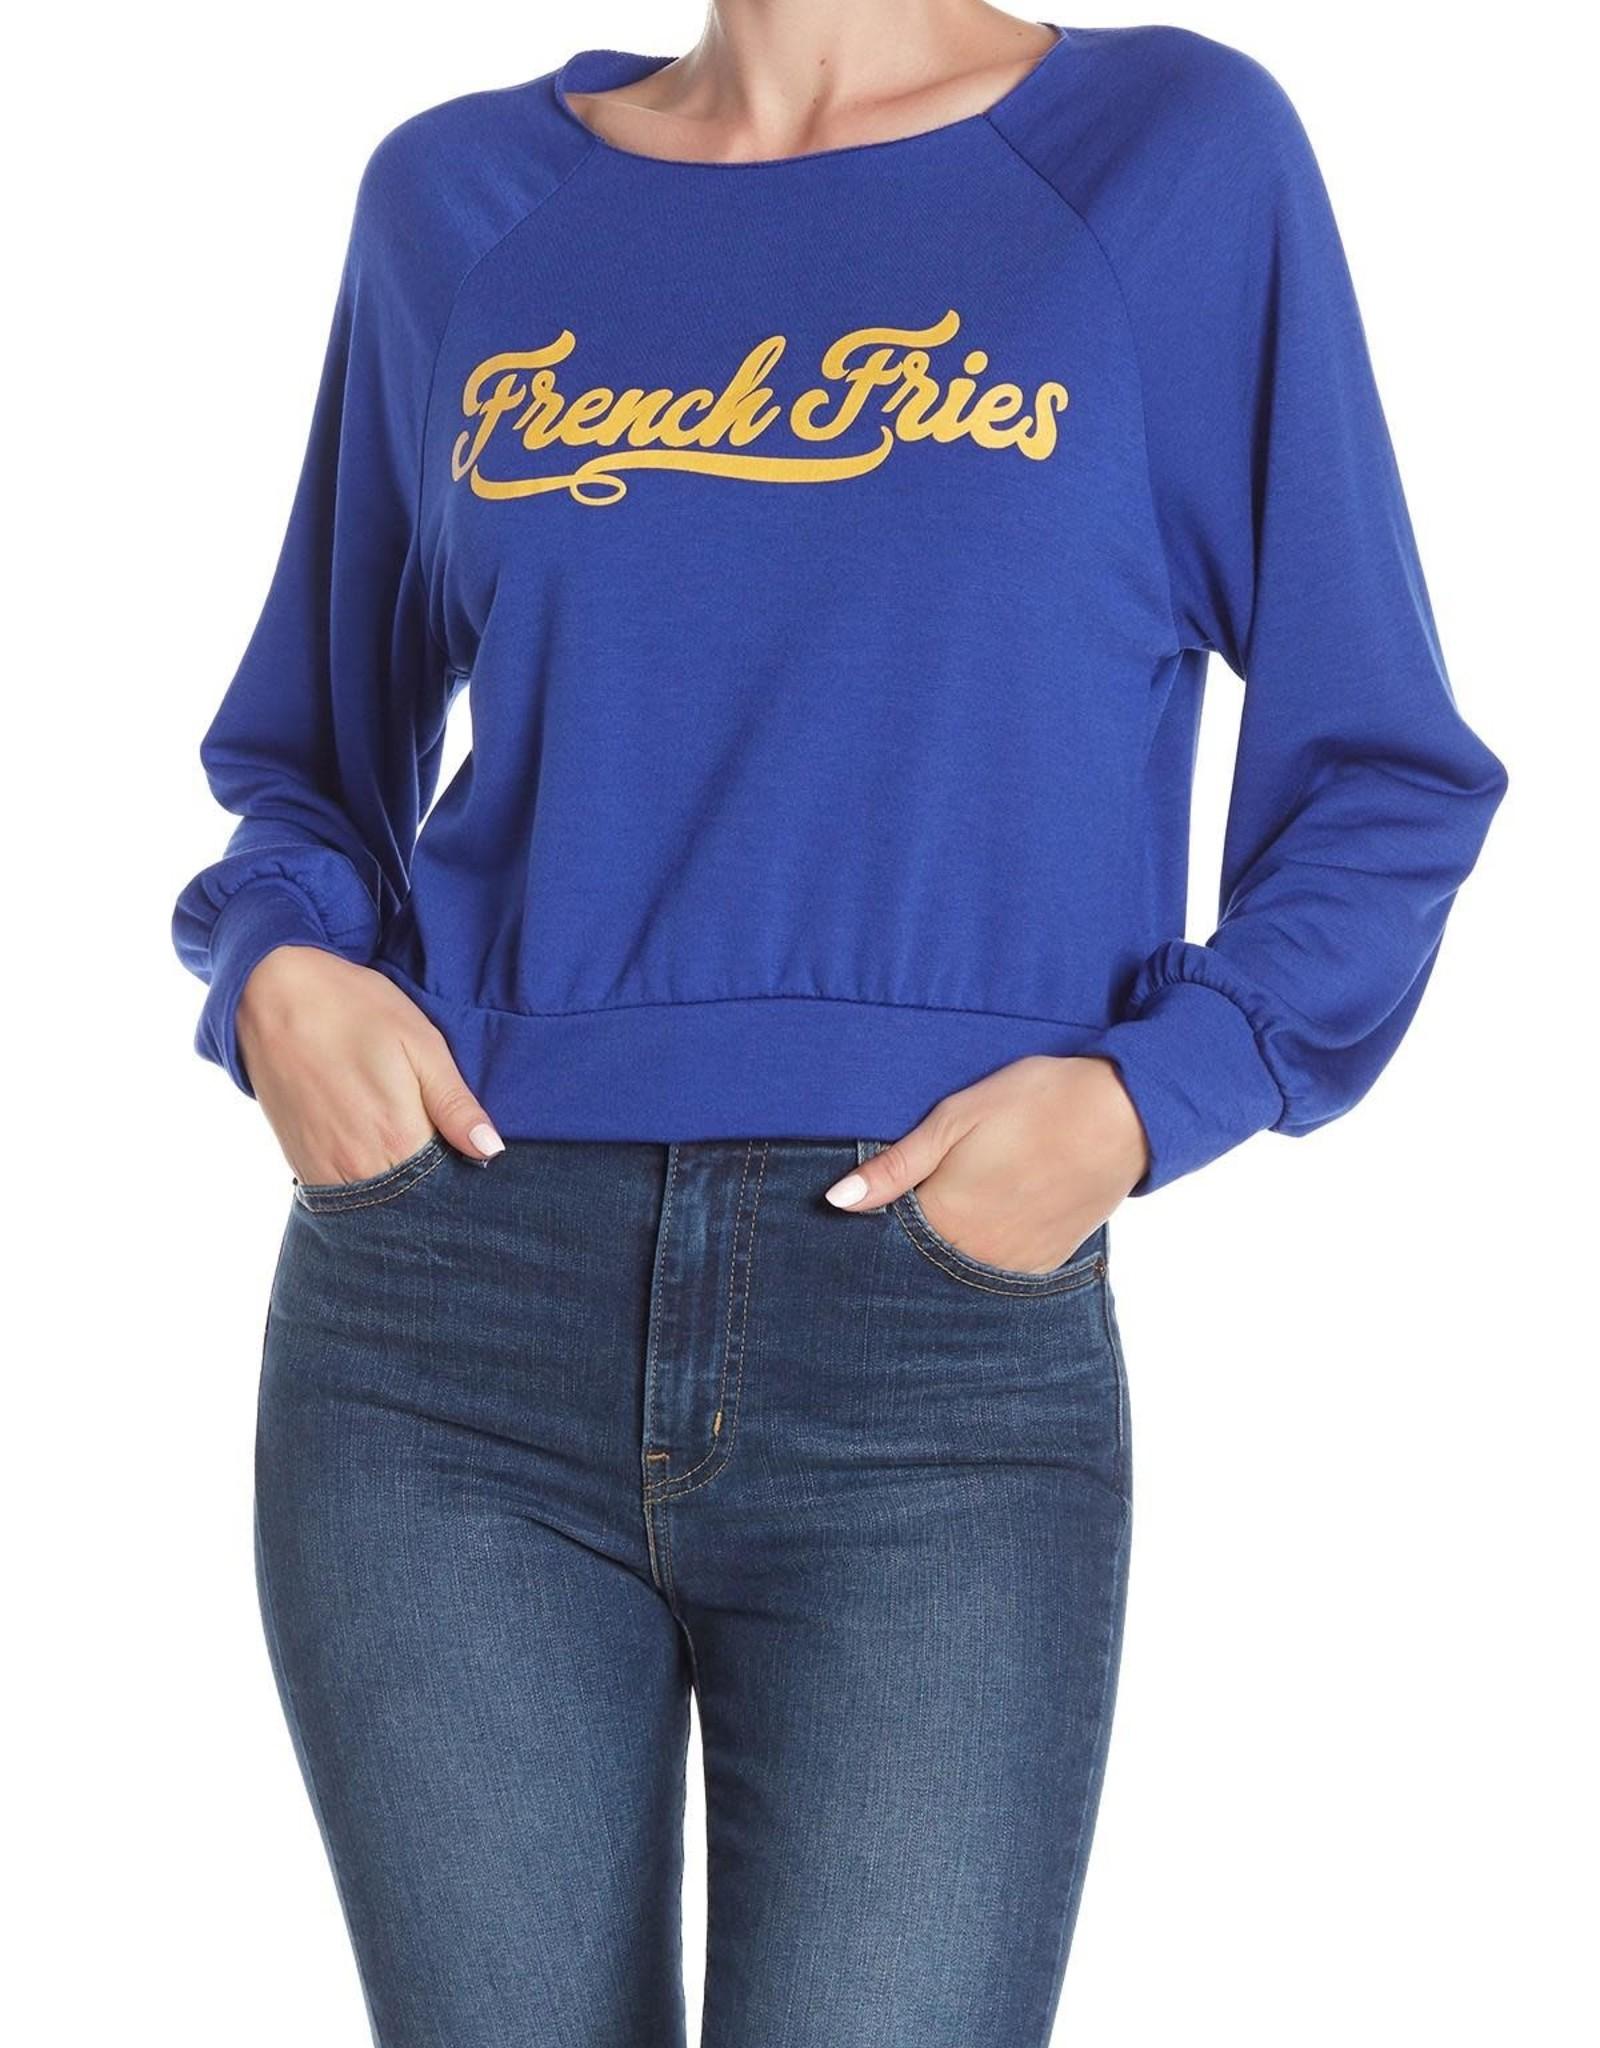 hiatus Hiatus Crewneck Blue Cropped French Fries Sweatshirt Sz L